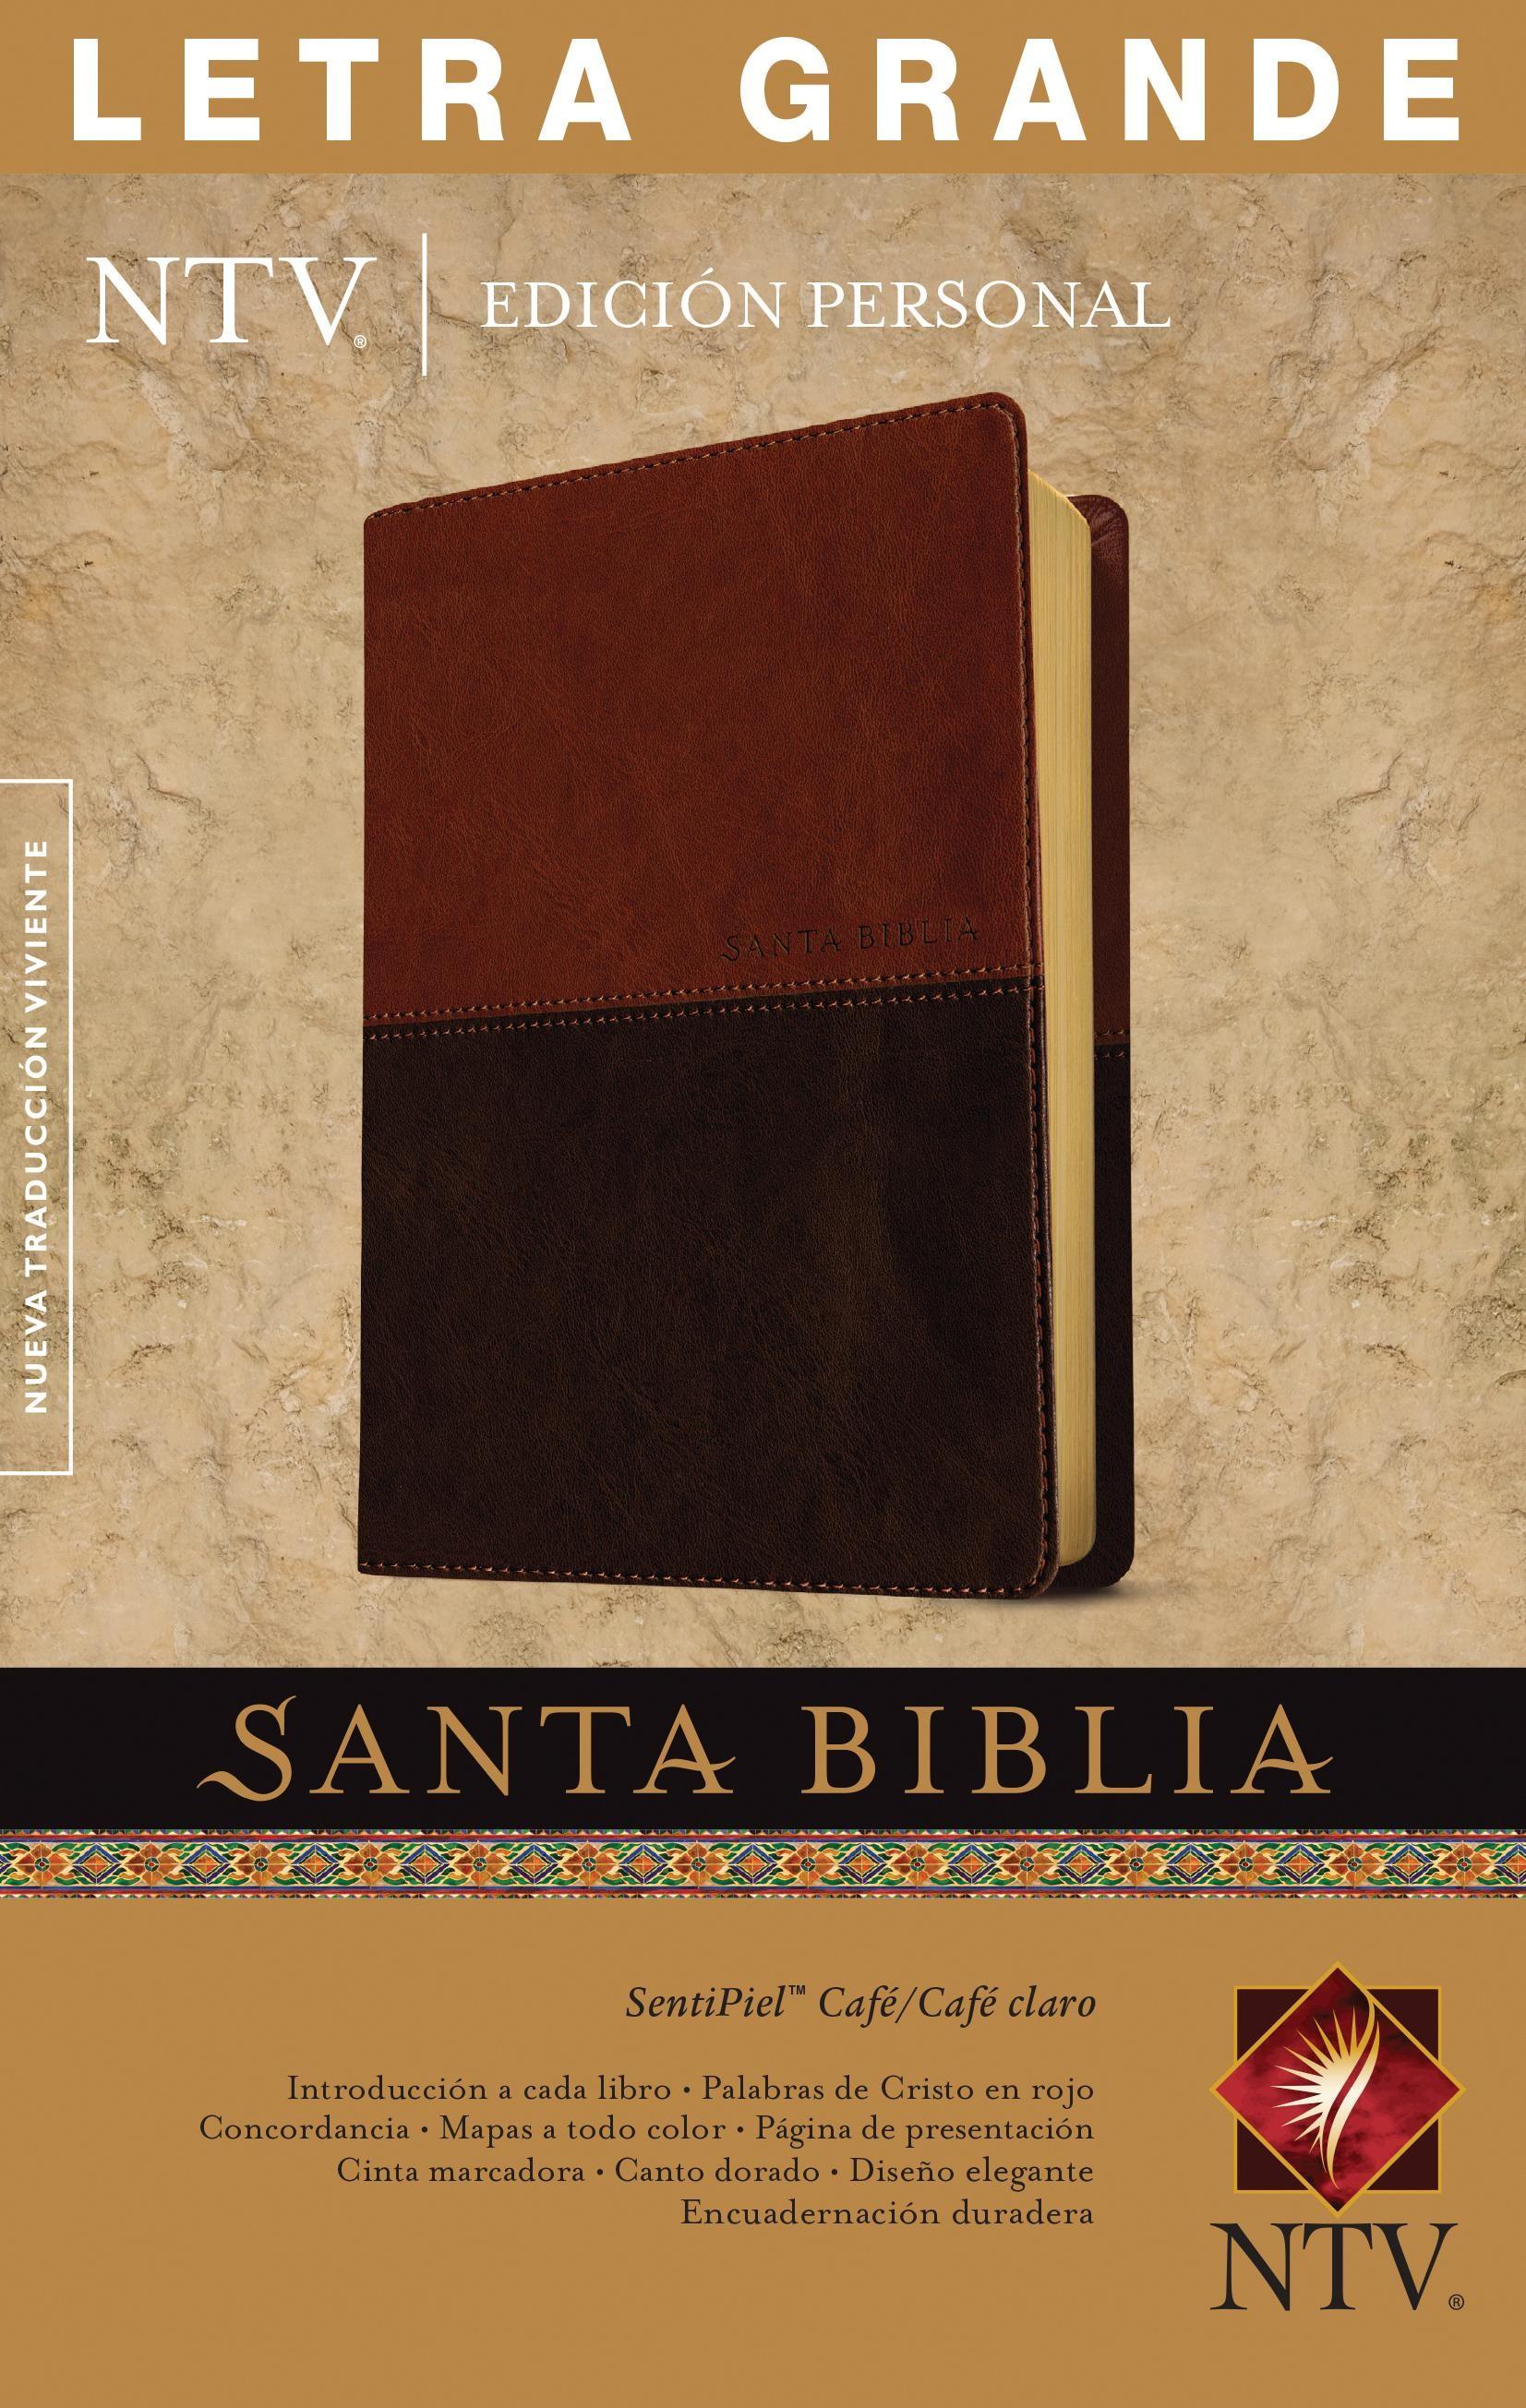 Santa Biblia NTV, Edición personal, letra grande, DuoTono (Letra Roja, SentiPiel, Café/Café claro)